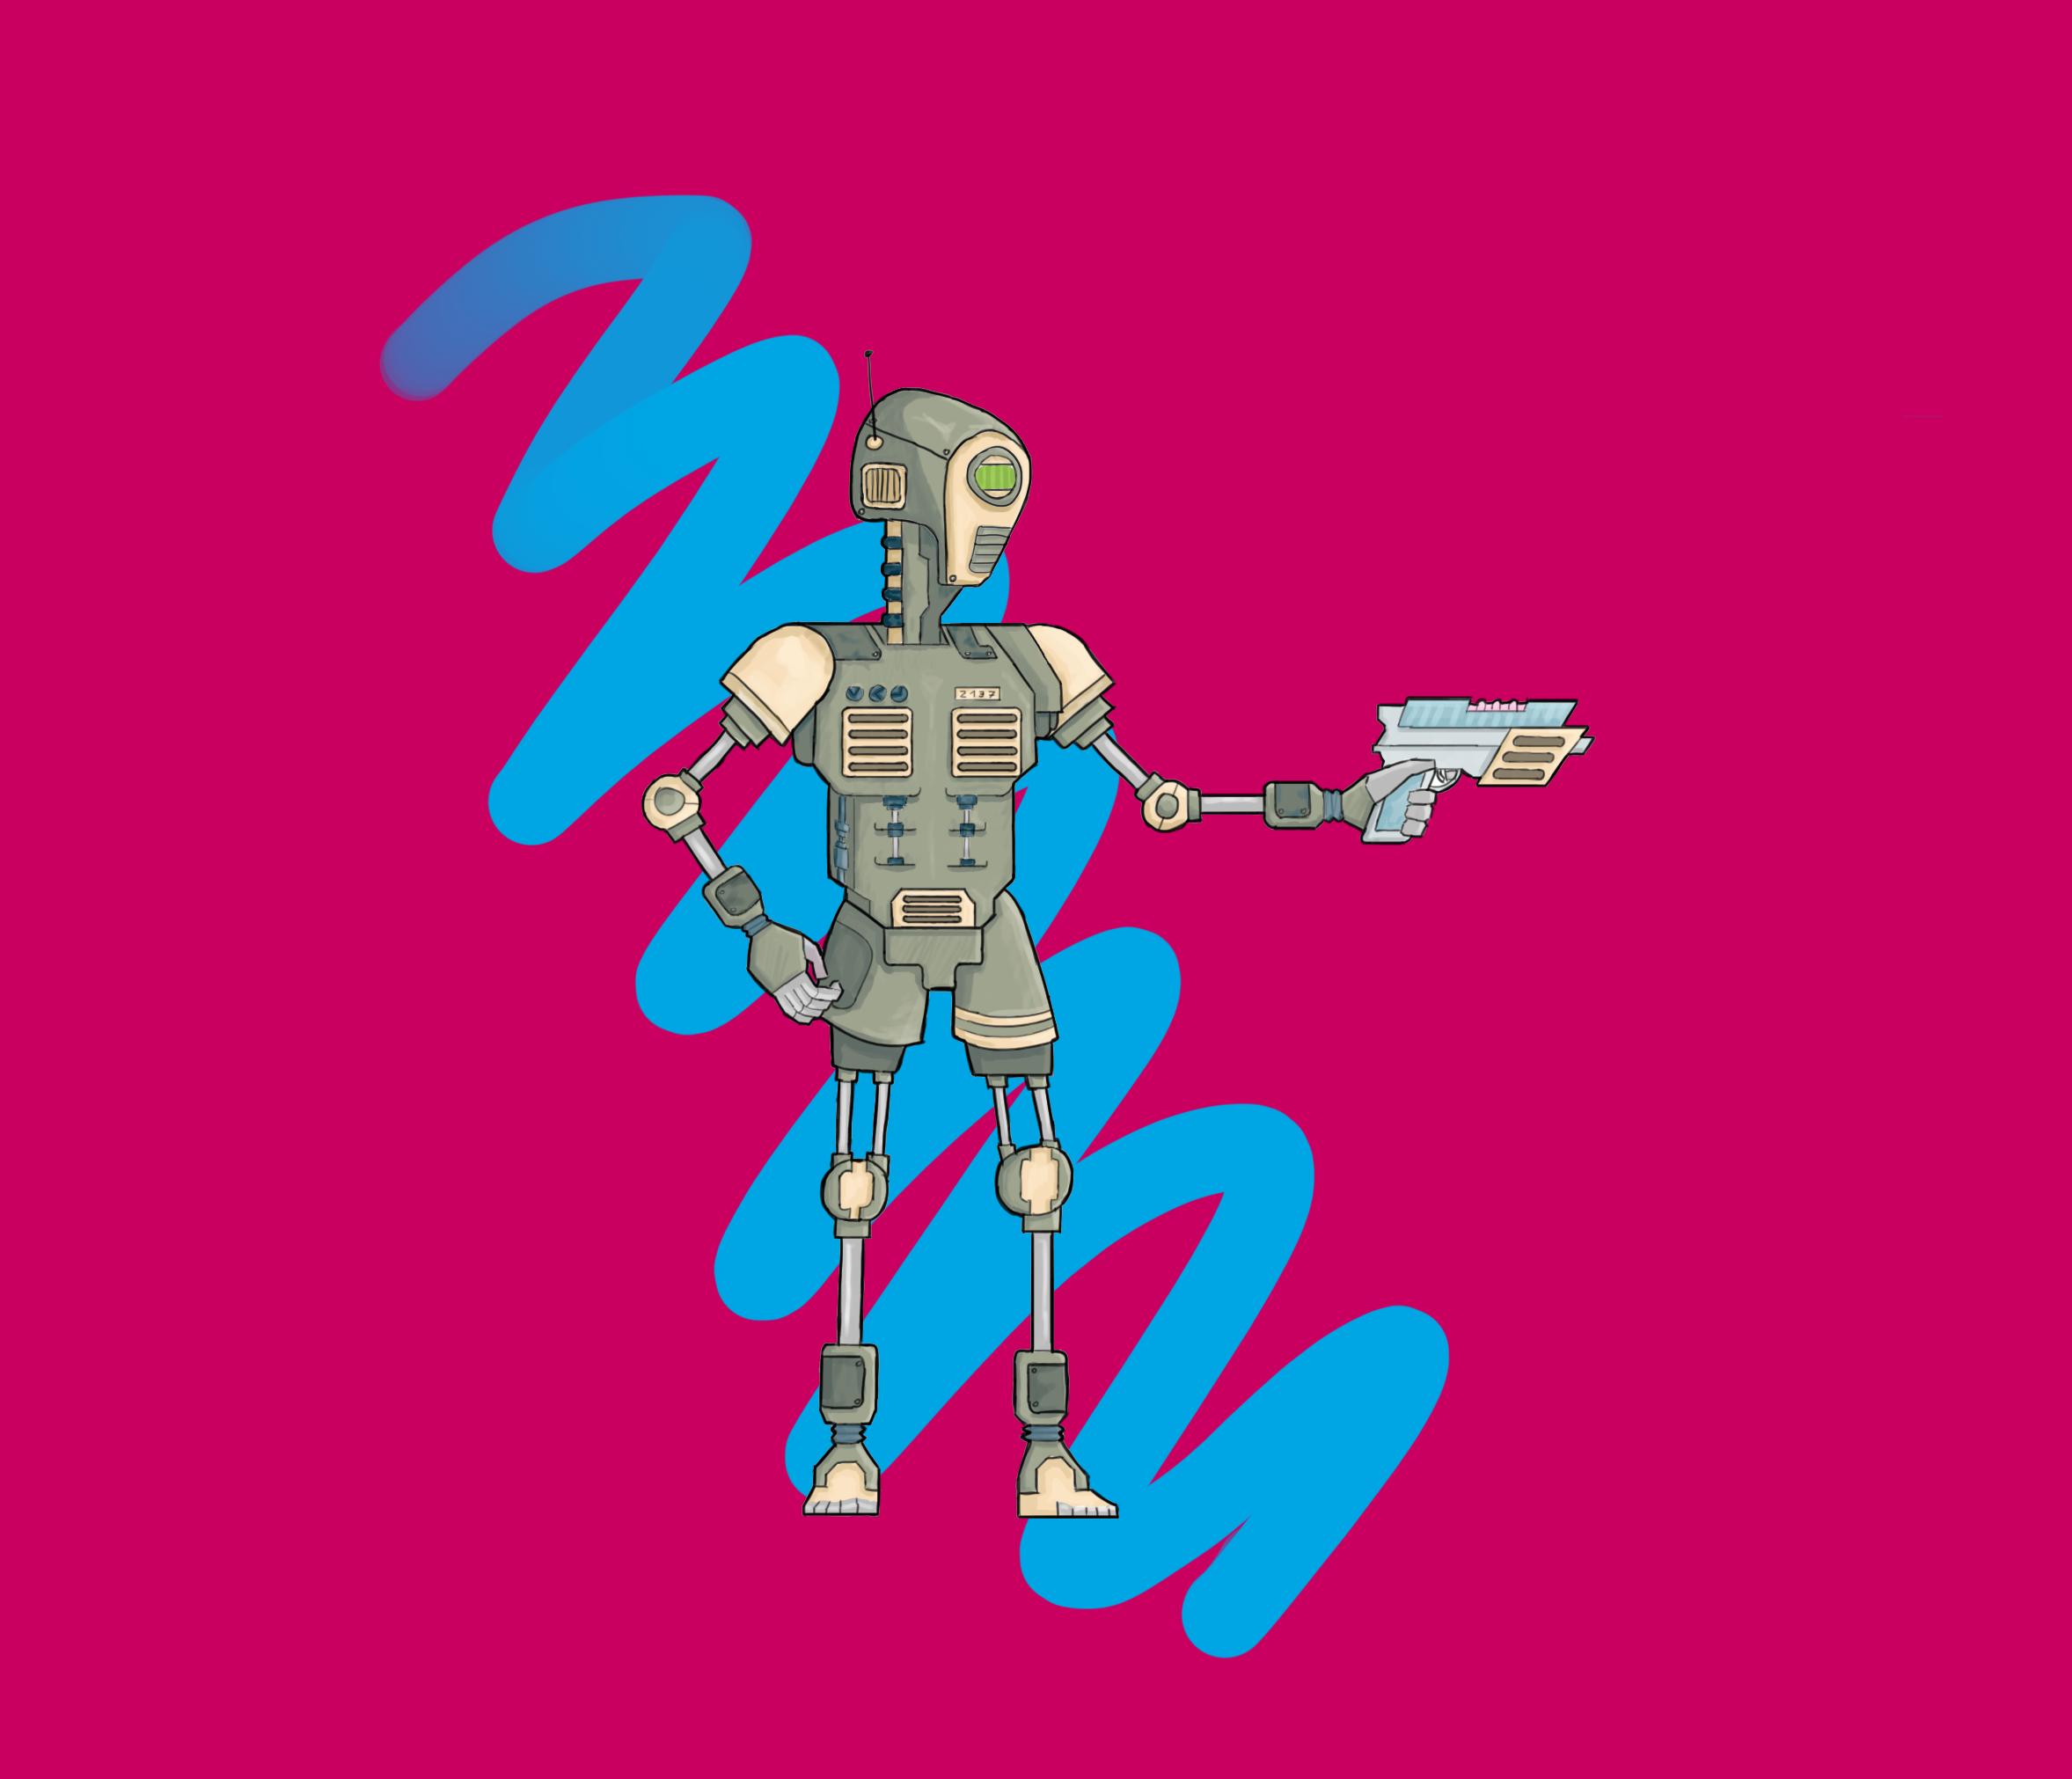 robot_spoko_ziomek_concept1f9ba.png